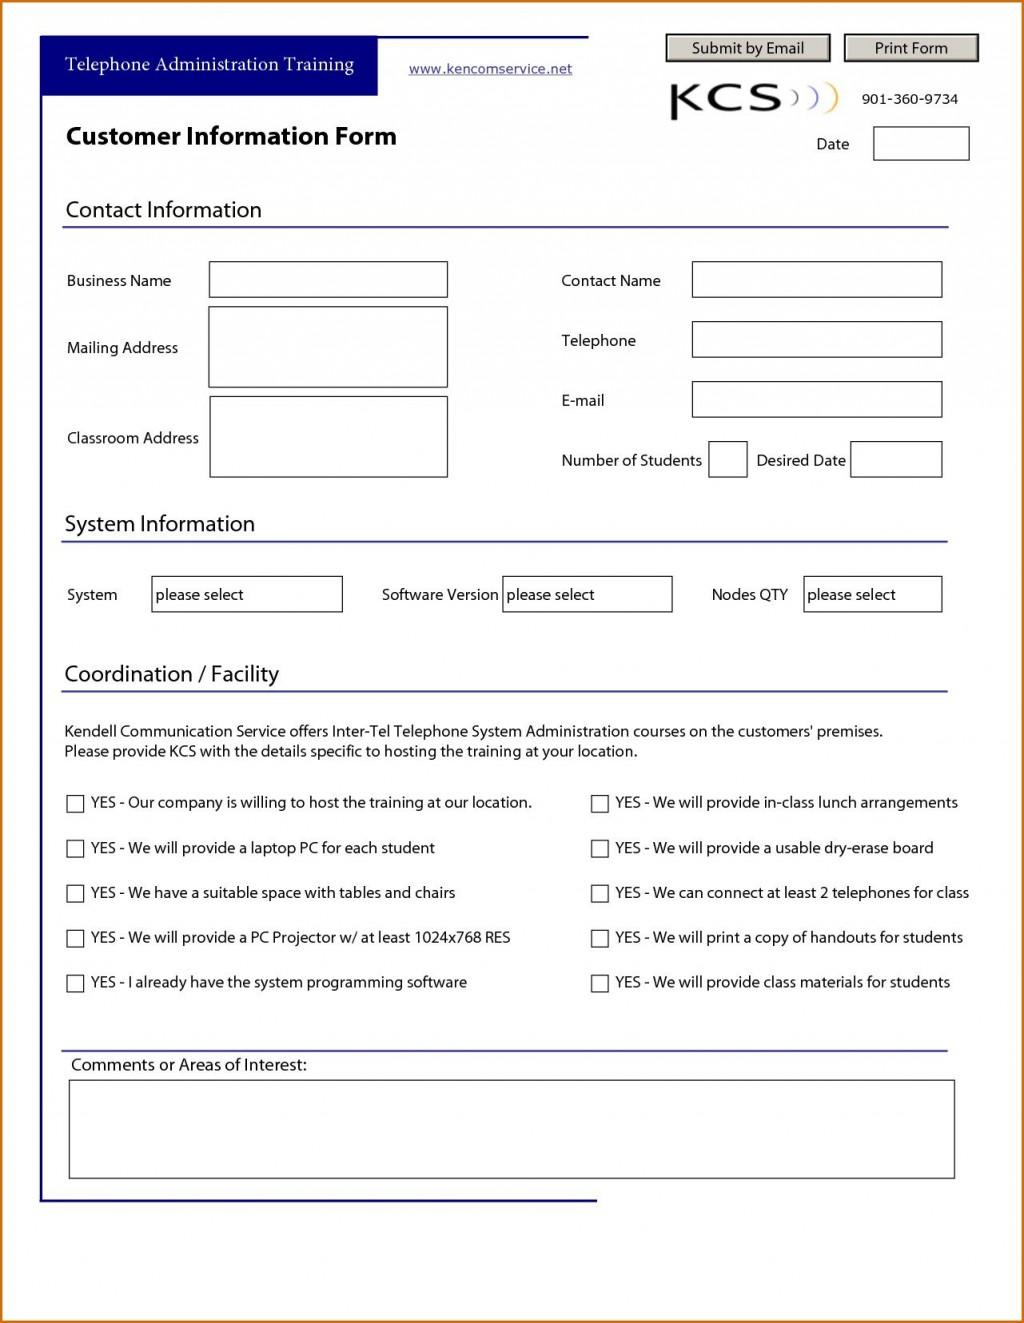 007 Surprising Customer Information Sheet Template Idea  New Info Excel SpreadsheetLarge